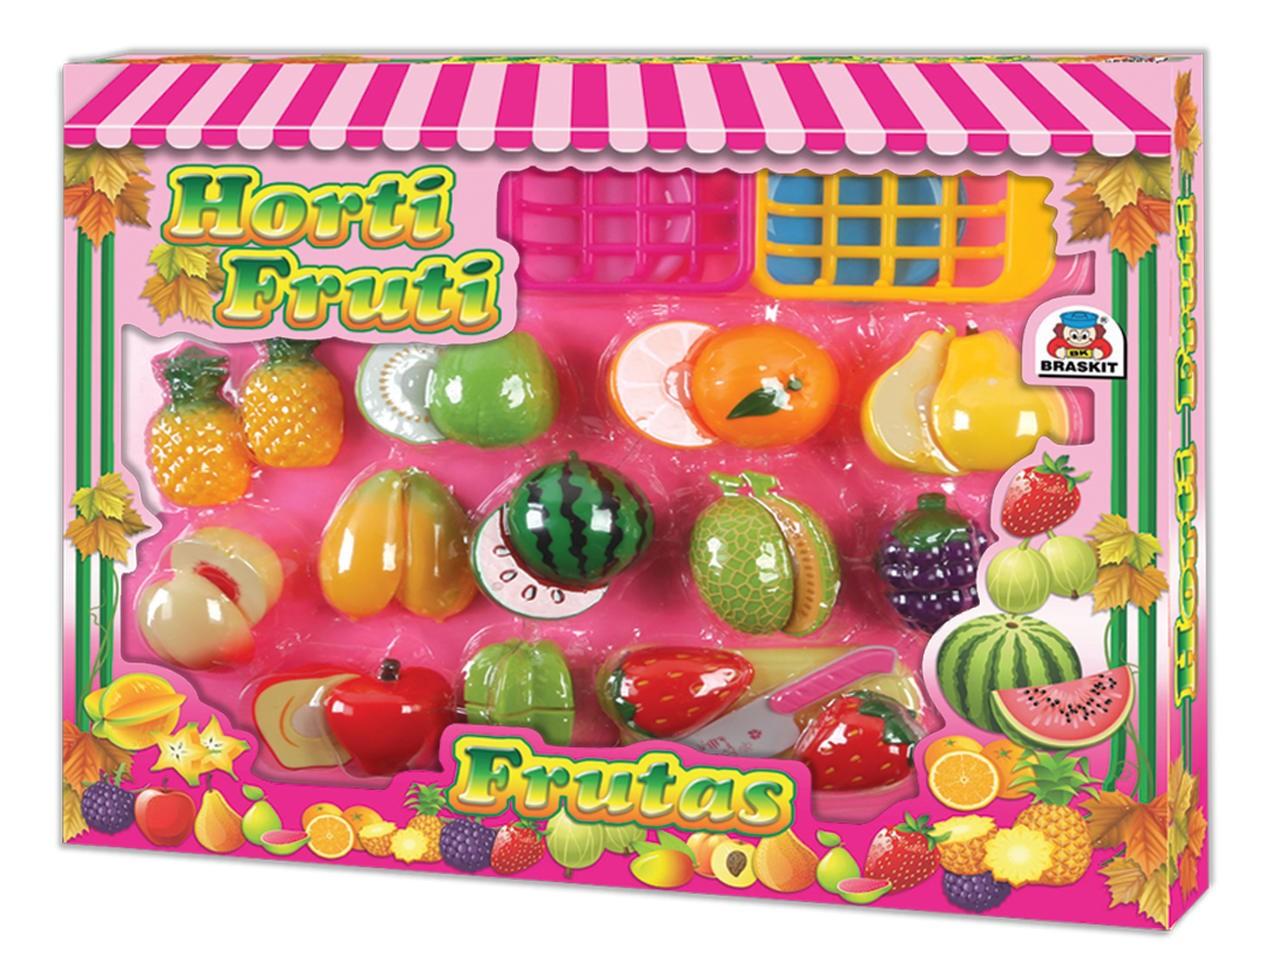 Horti Fruti Frutas Comidinha Crec Crec Infantil